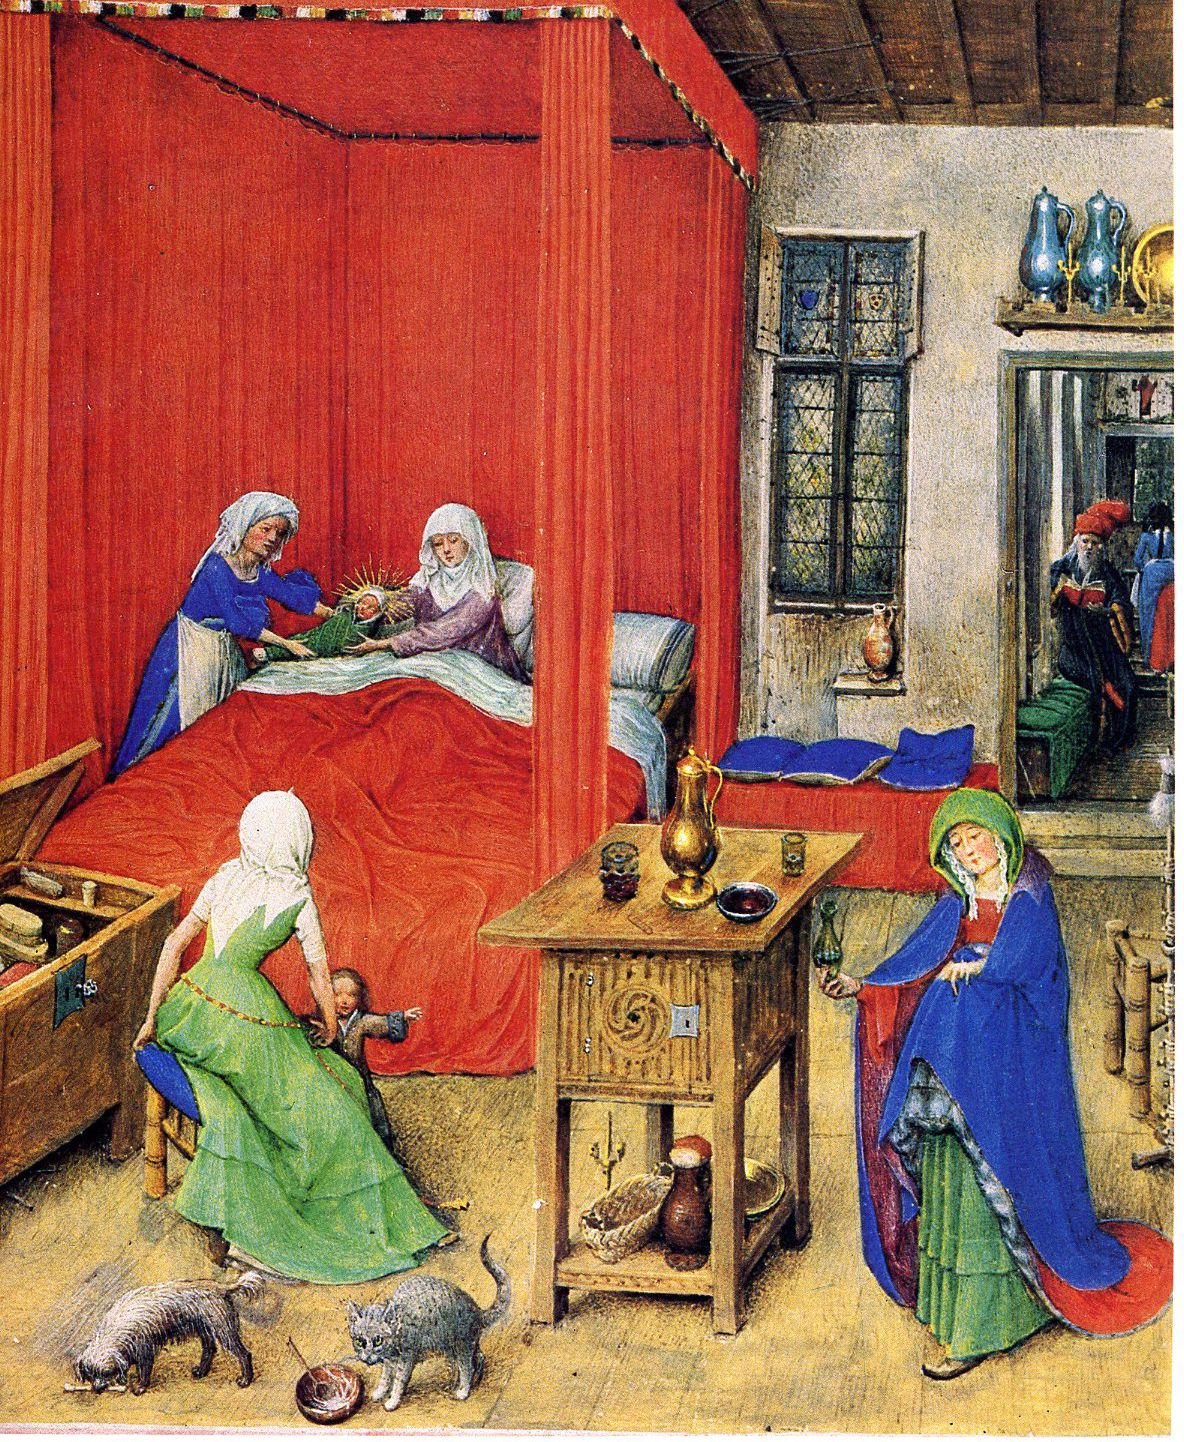 where was jan van eyck born